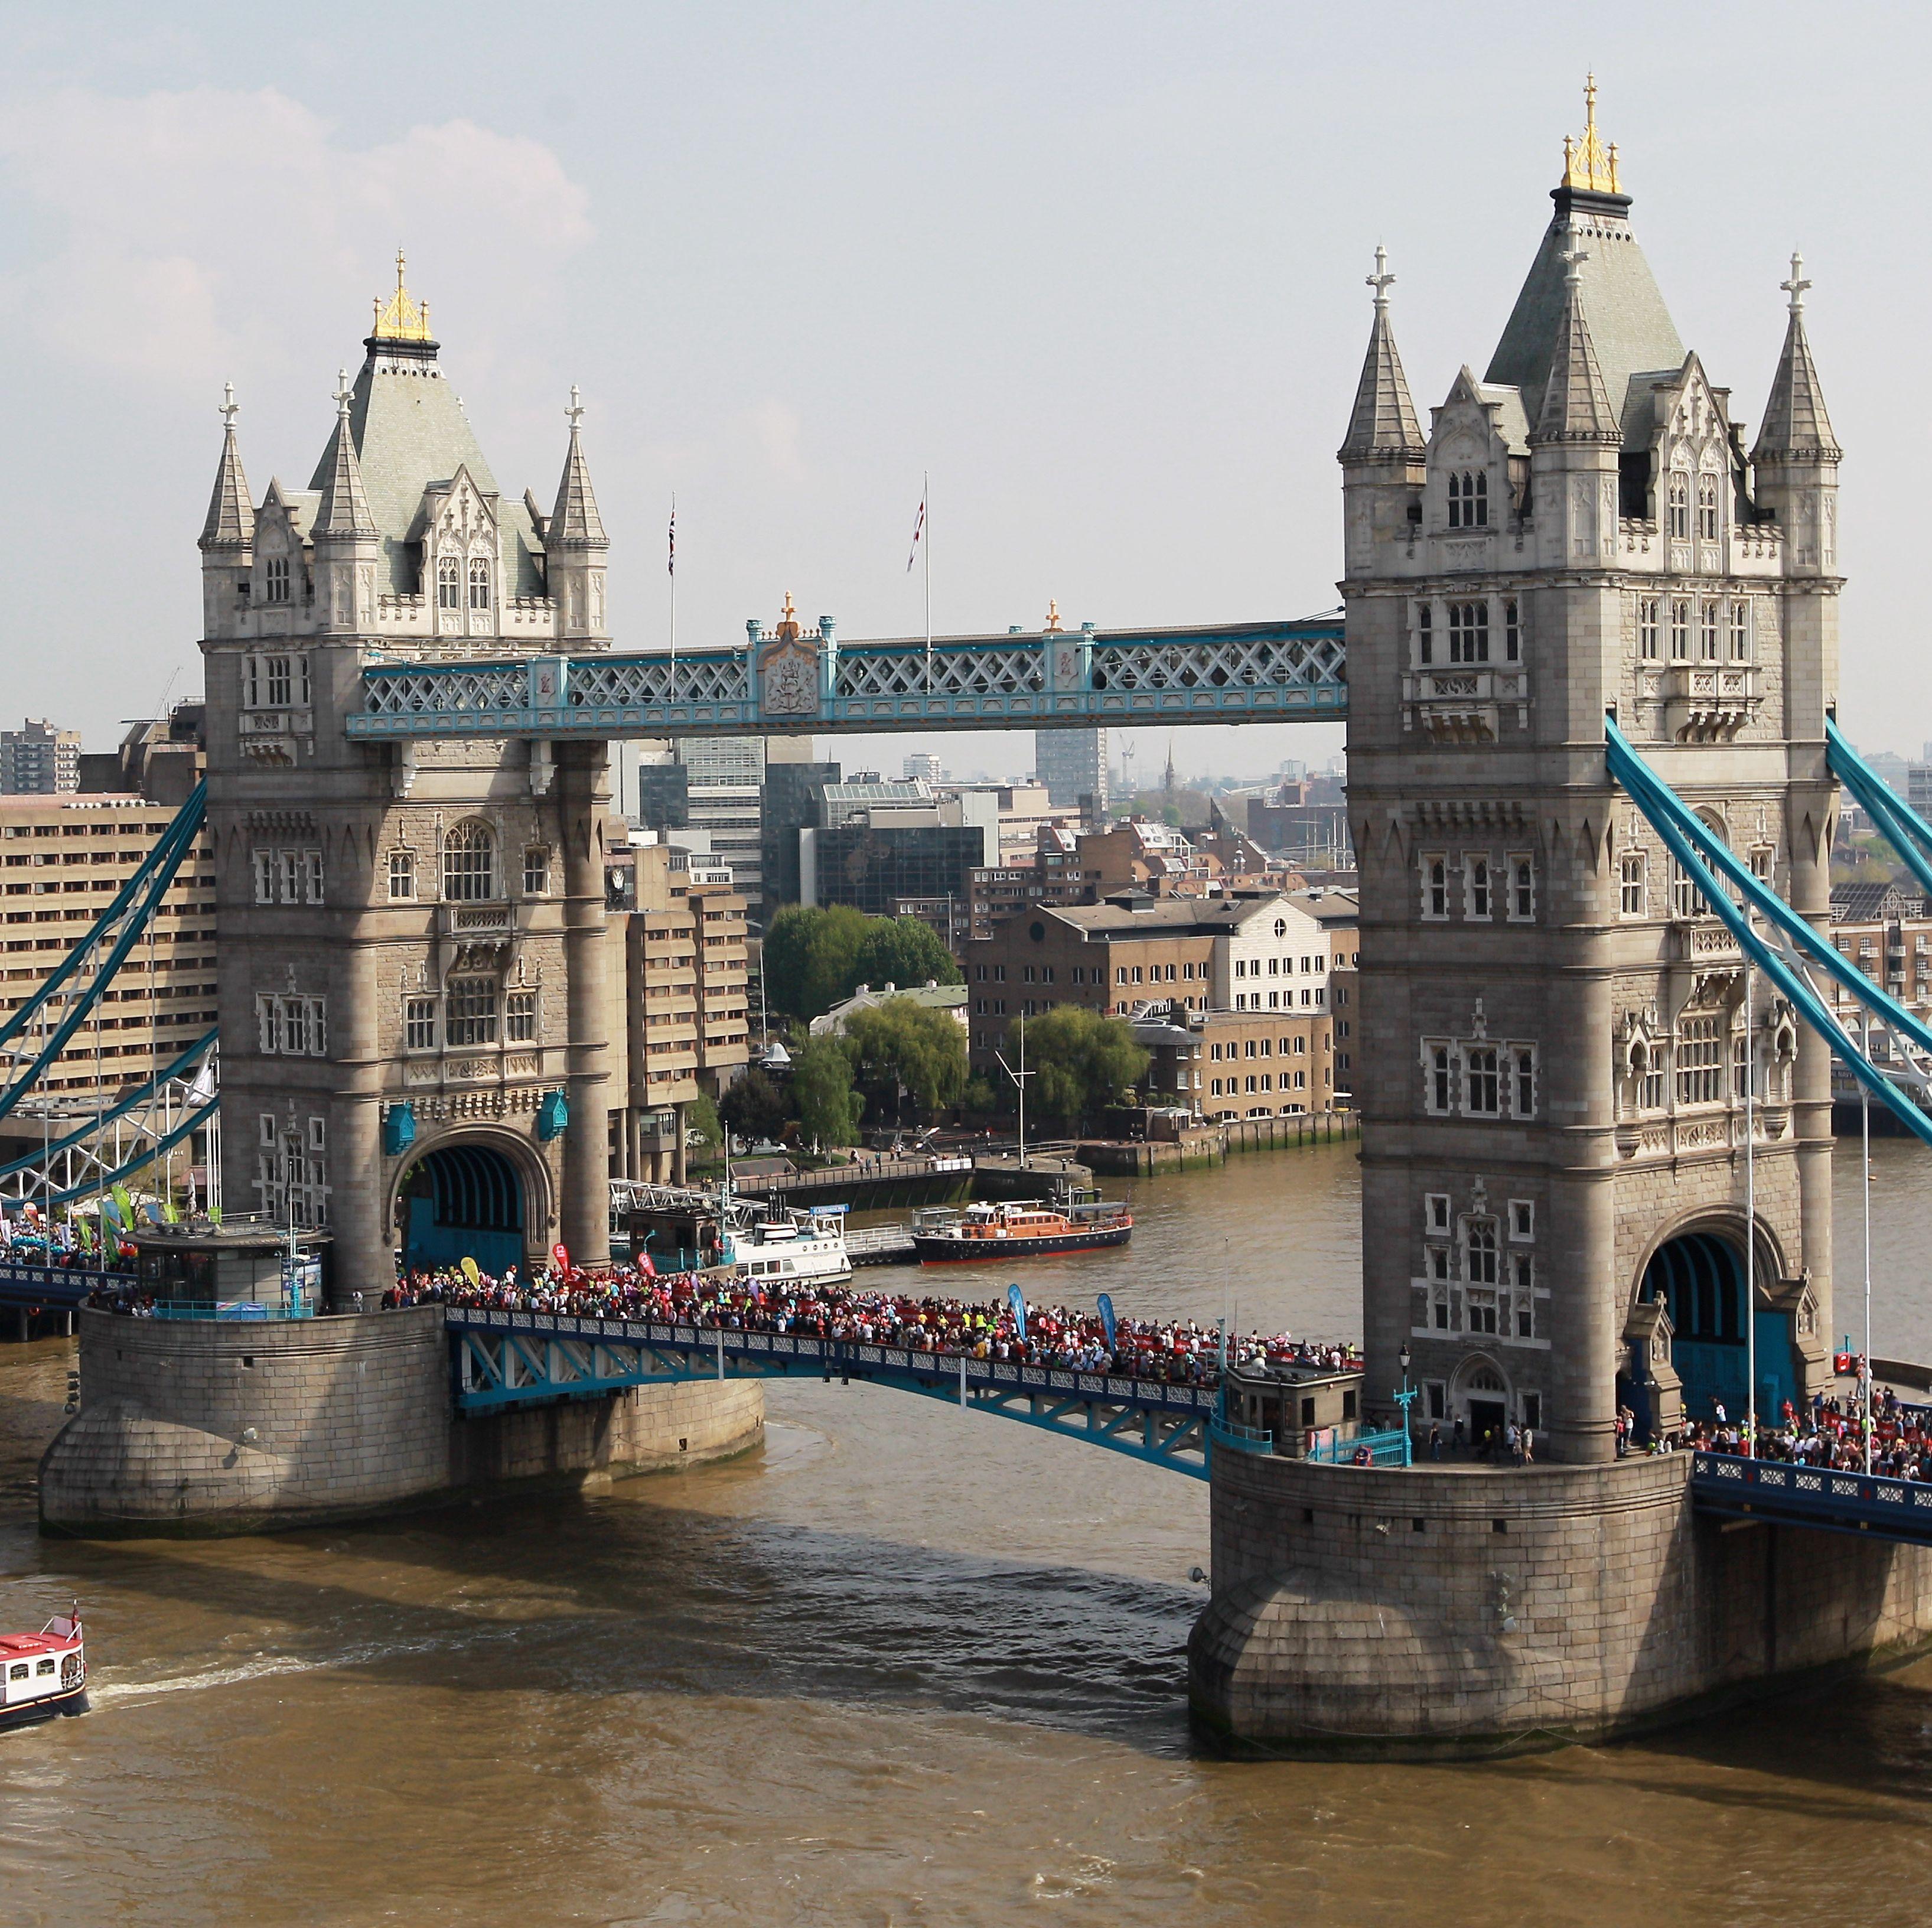 London Marathon Entries Inch Close to Half a Million